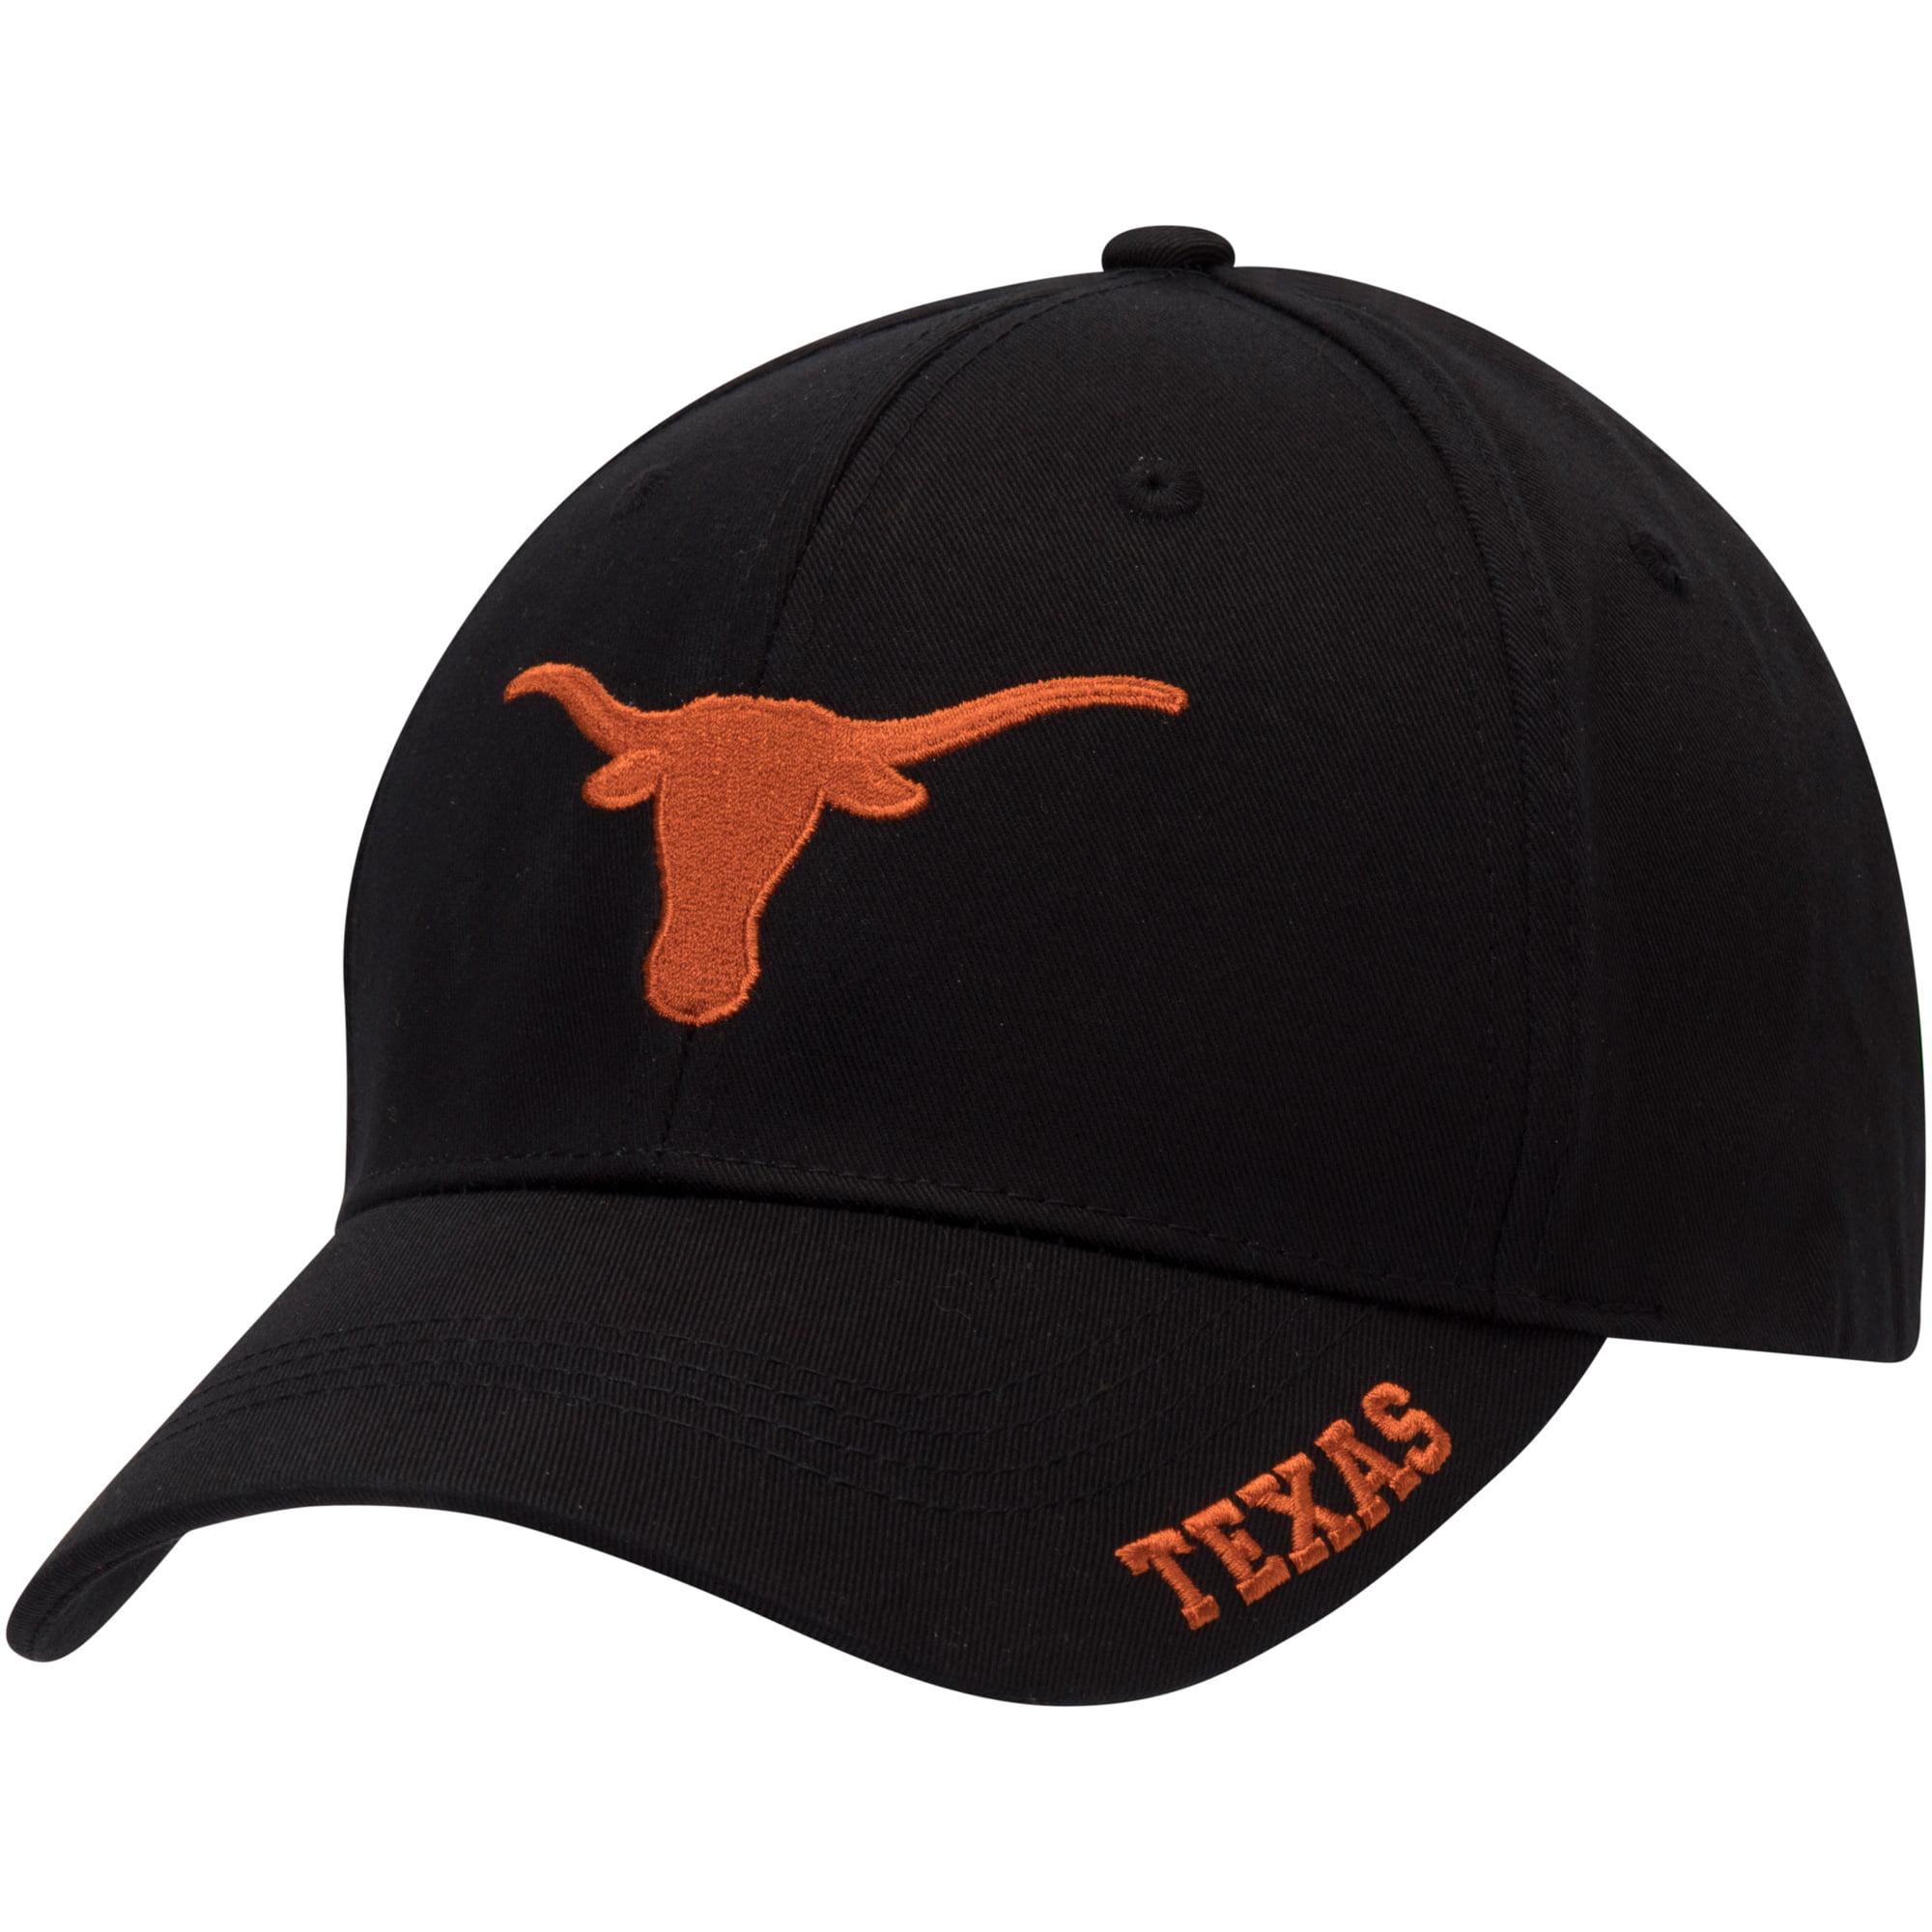 Men's Black Texas Longhorns Silhouette Adjustable Hat - OSFA